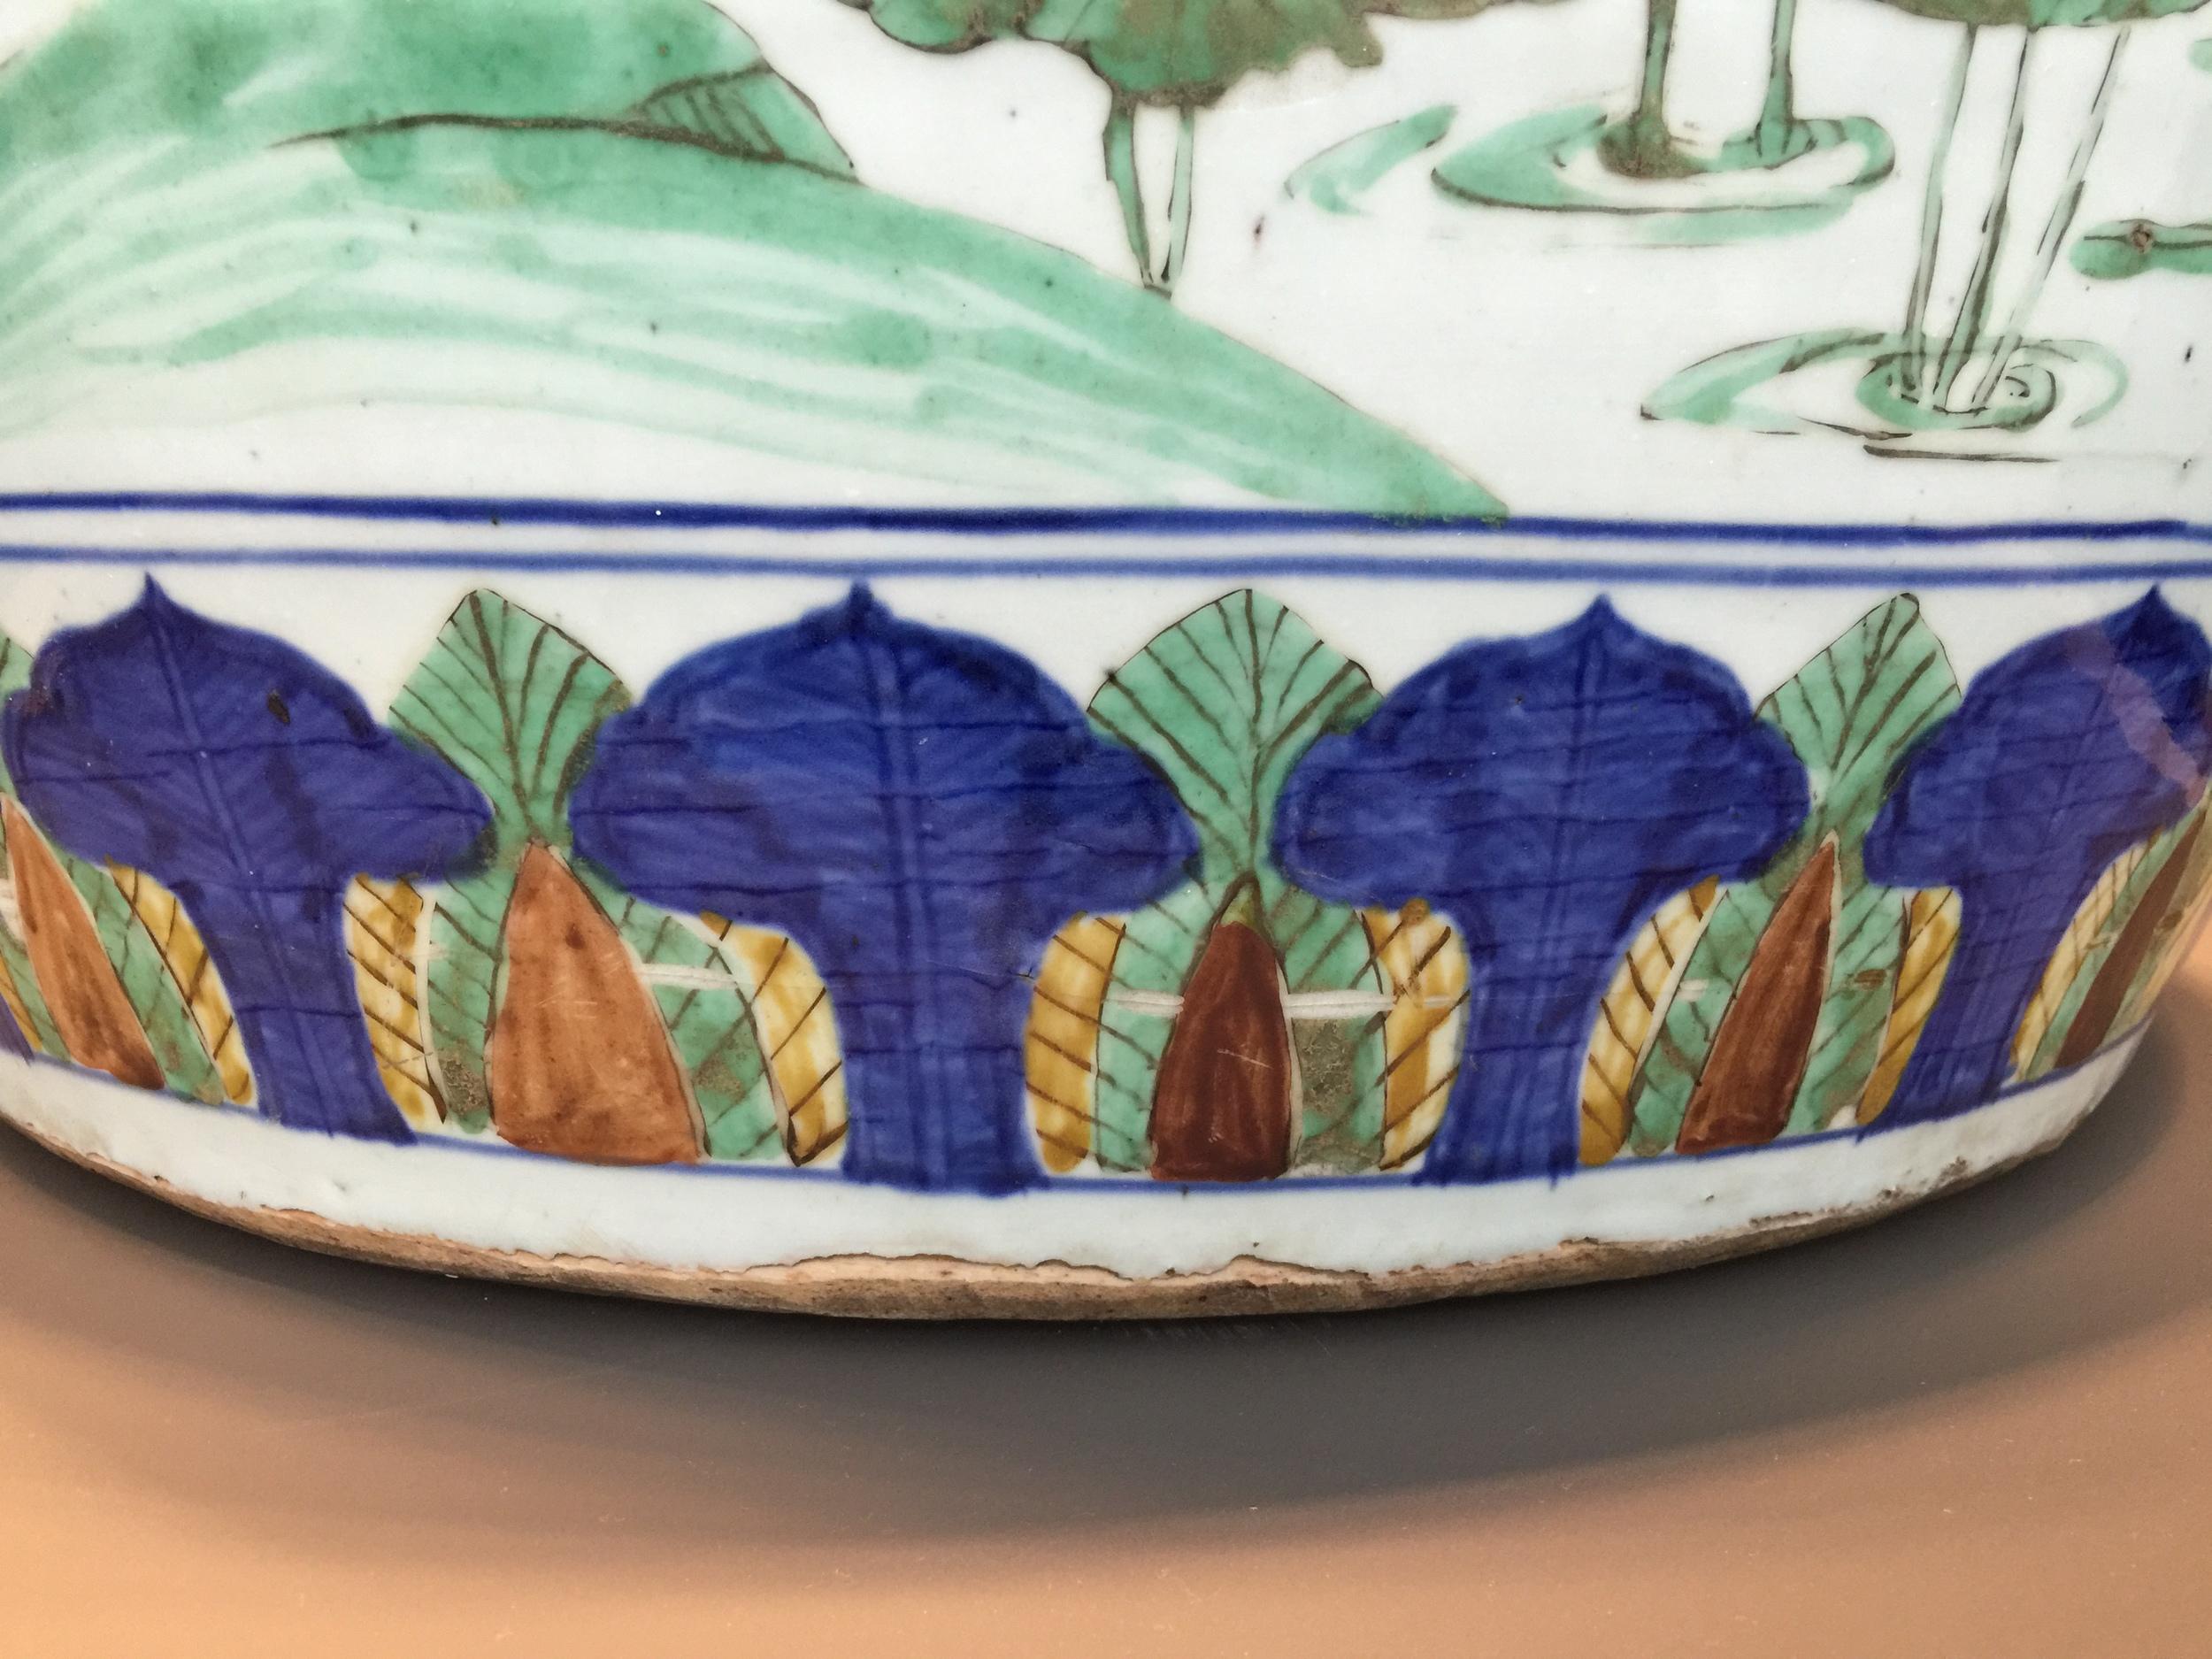 Chinese-Porcelain-British-Museum-Percival-David-jessewaugh.com-29.jpg